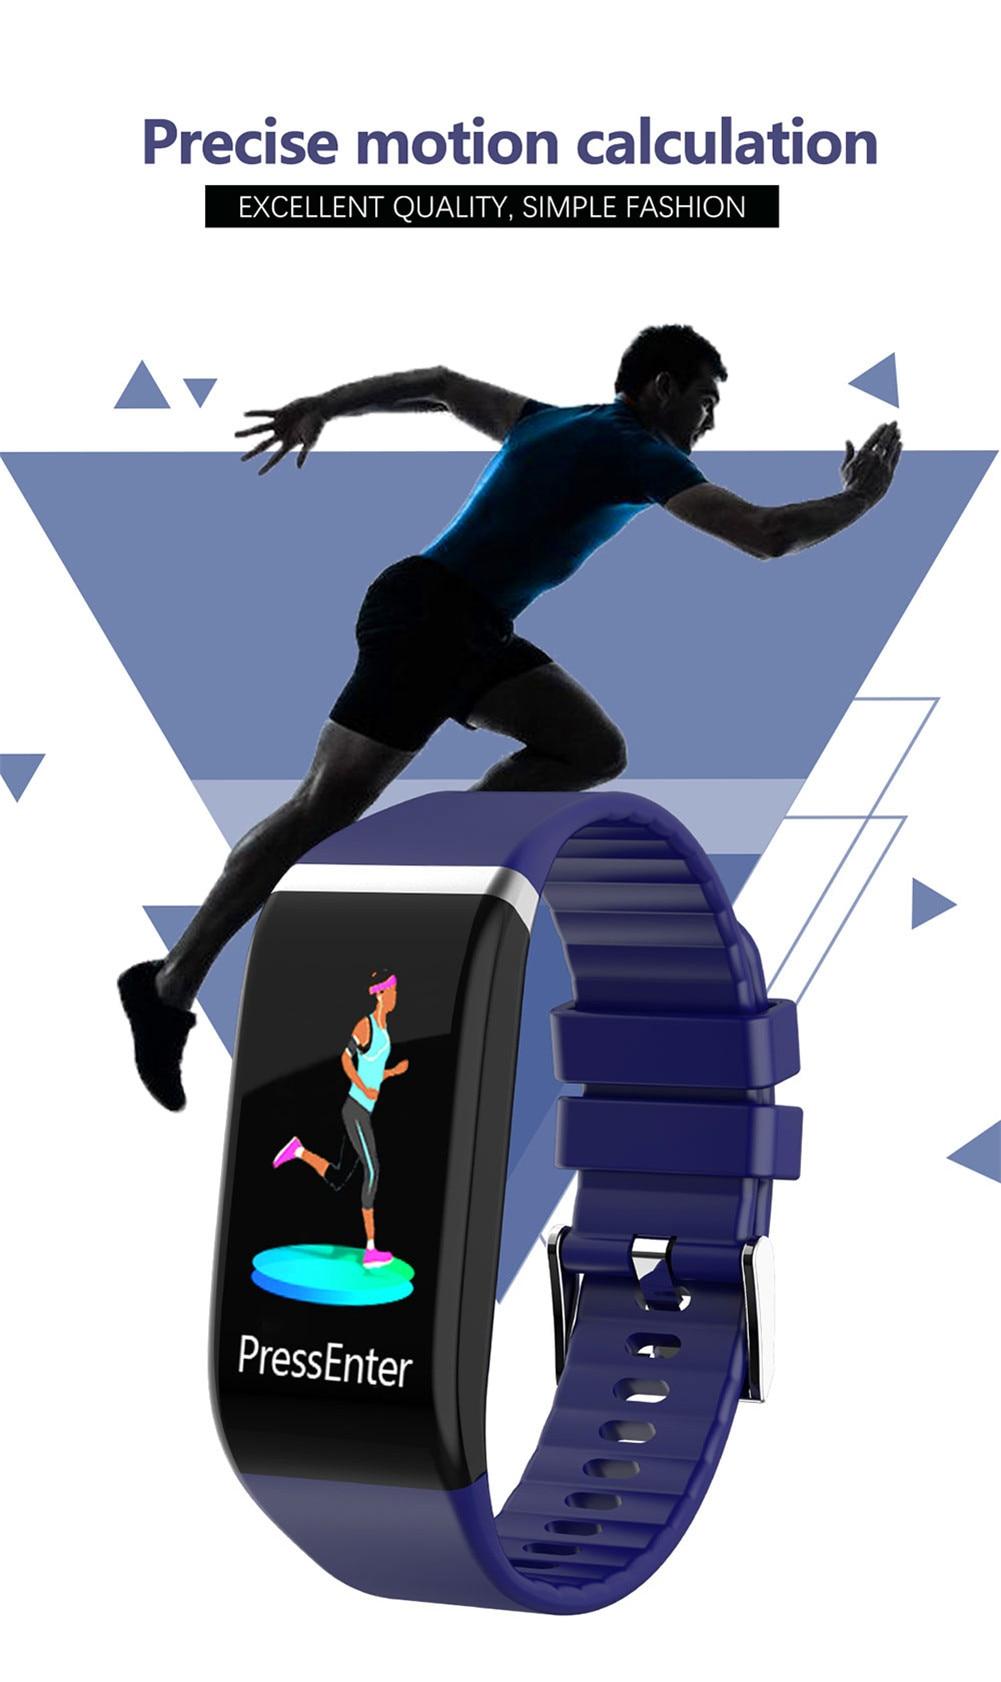 H9da4fe489cde4adf98198f6c805fd92b4 Smart Band Blood Pressure 1.14'' Screen Fitness Tracker Watch Heart Rate Fitness Bracelet Waterproof Music Control For Men Women